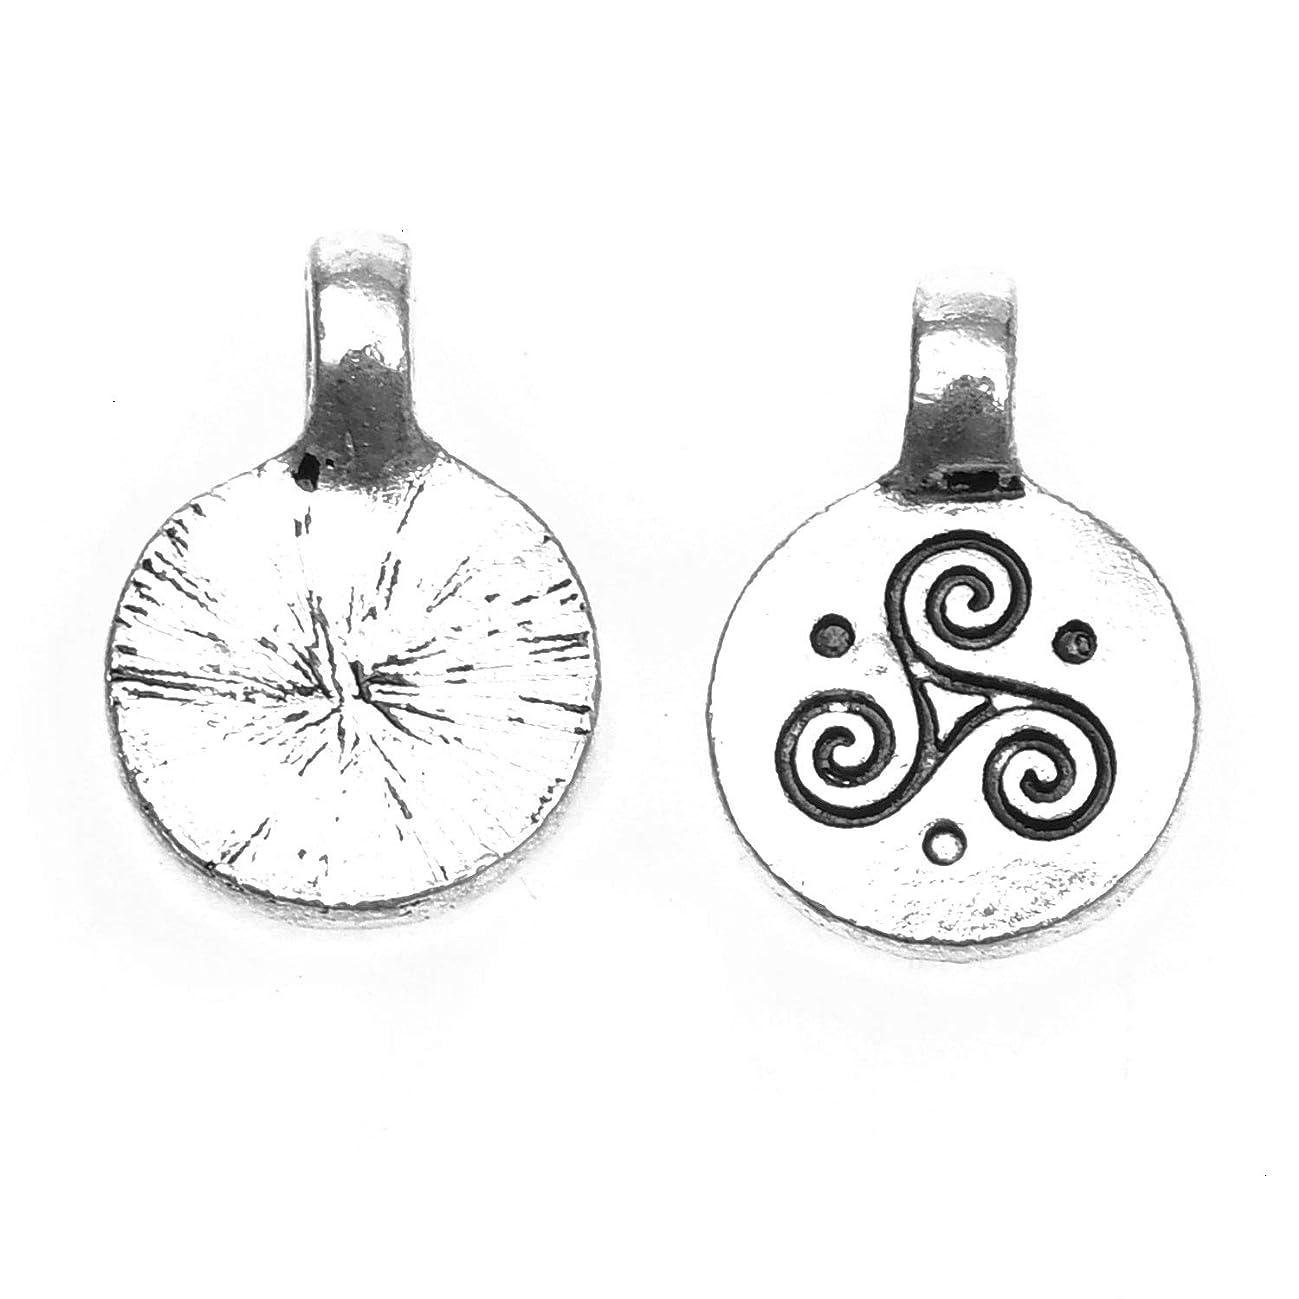 Monrocco 50 Pcs Antique Silver Triple Spiral Charm Celtic Triskele Charms Pendant for Bracelets Jewelry Making